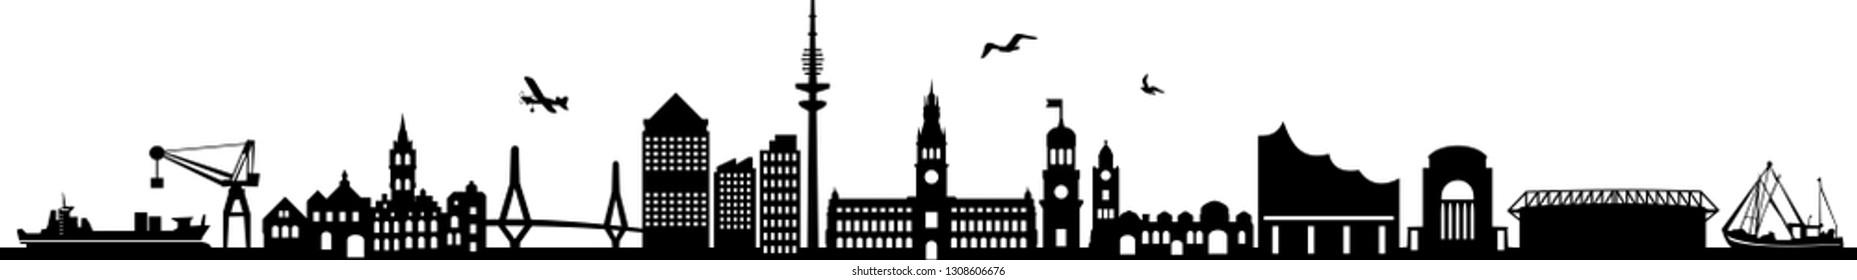 Hamburg City Skyline